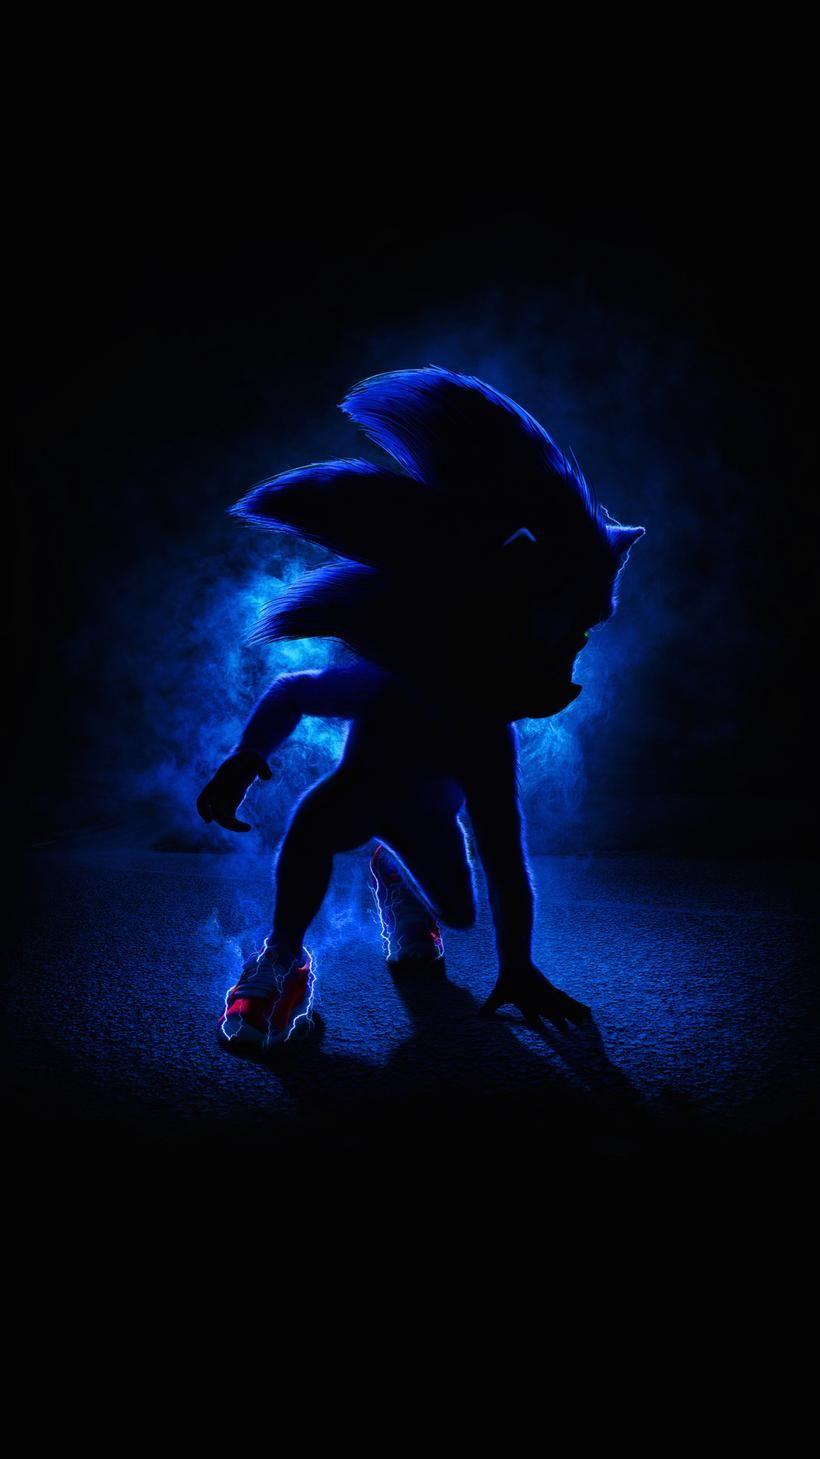 Sonic the Hedgehog 2020 Phone Wallpaper Hedgehog movie Sonic 820x1459